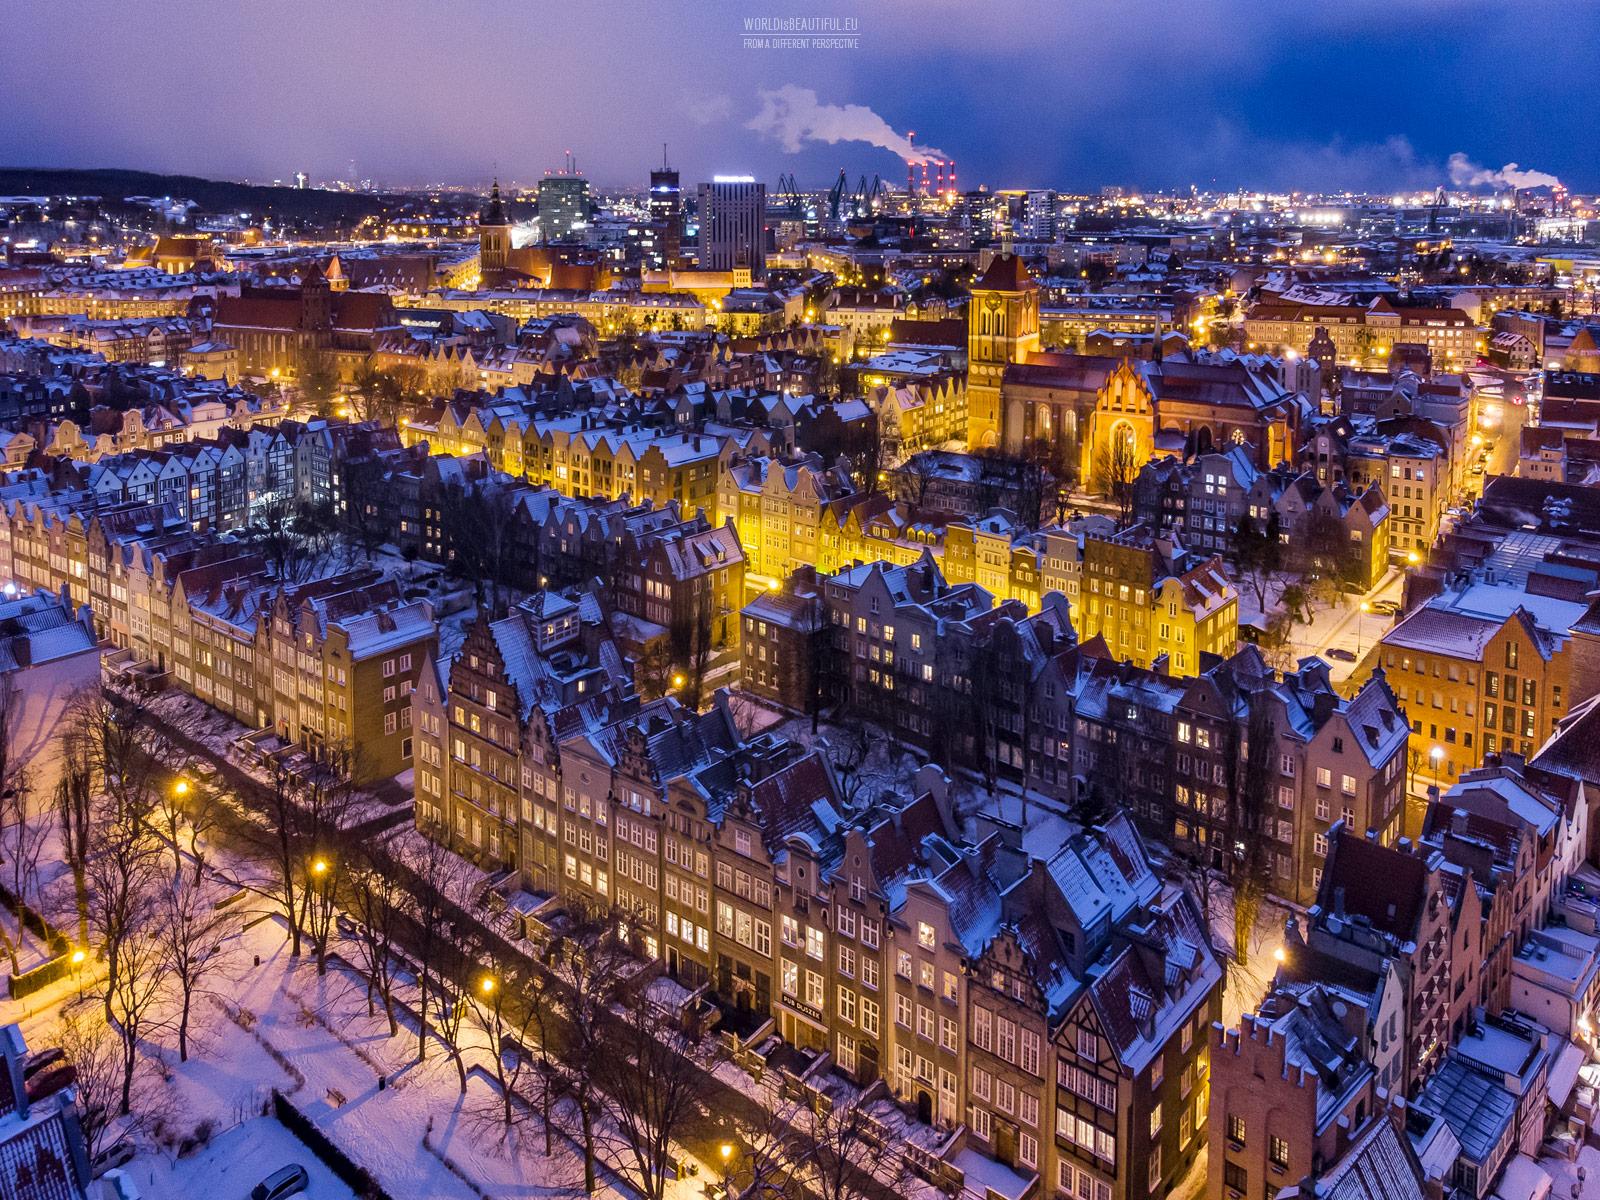 City lights - the night panorama of Gdańsk